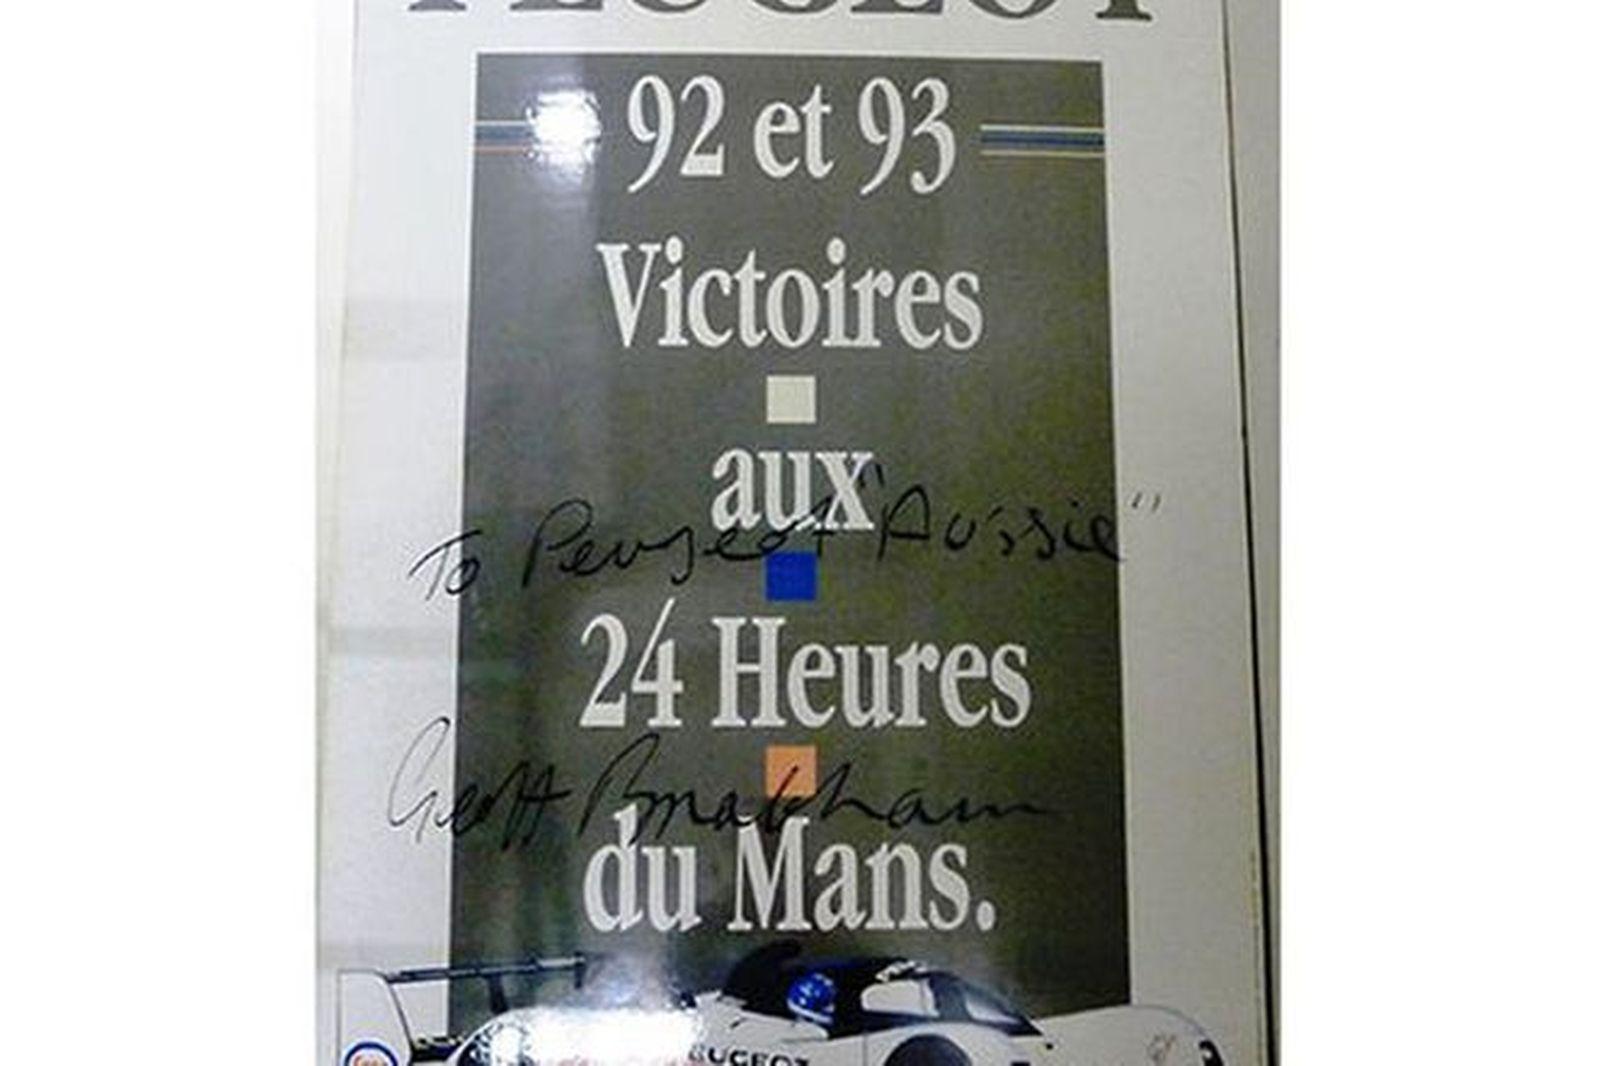 Signed Poster - Peugeot Foam Backed Sign celebrating the 24hr Le Mans Victories